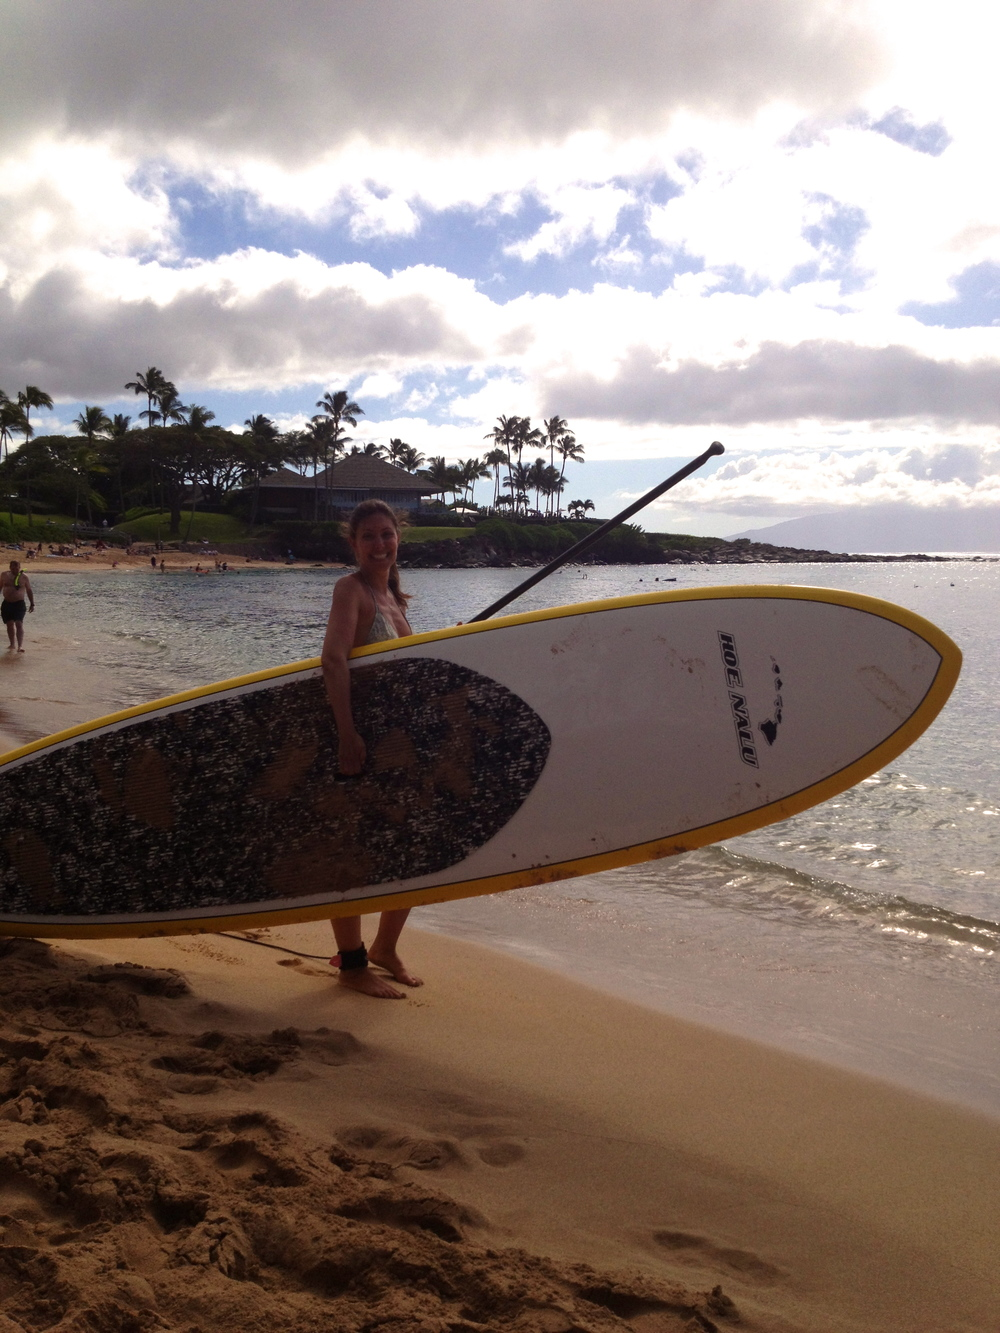 In Maui!